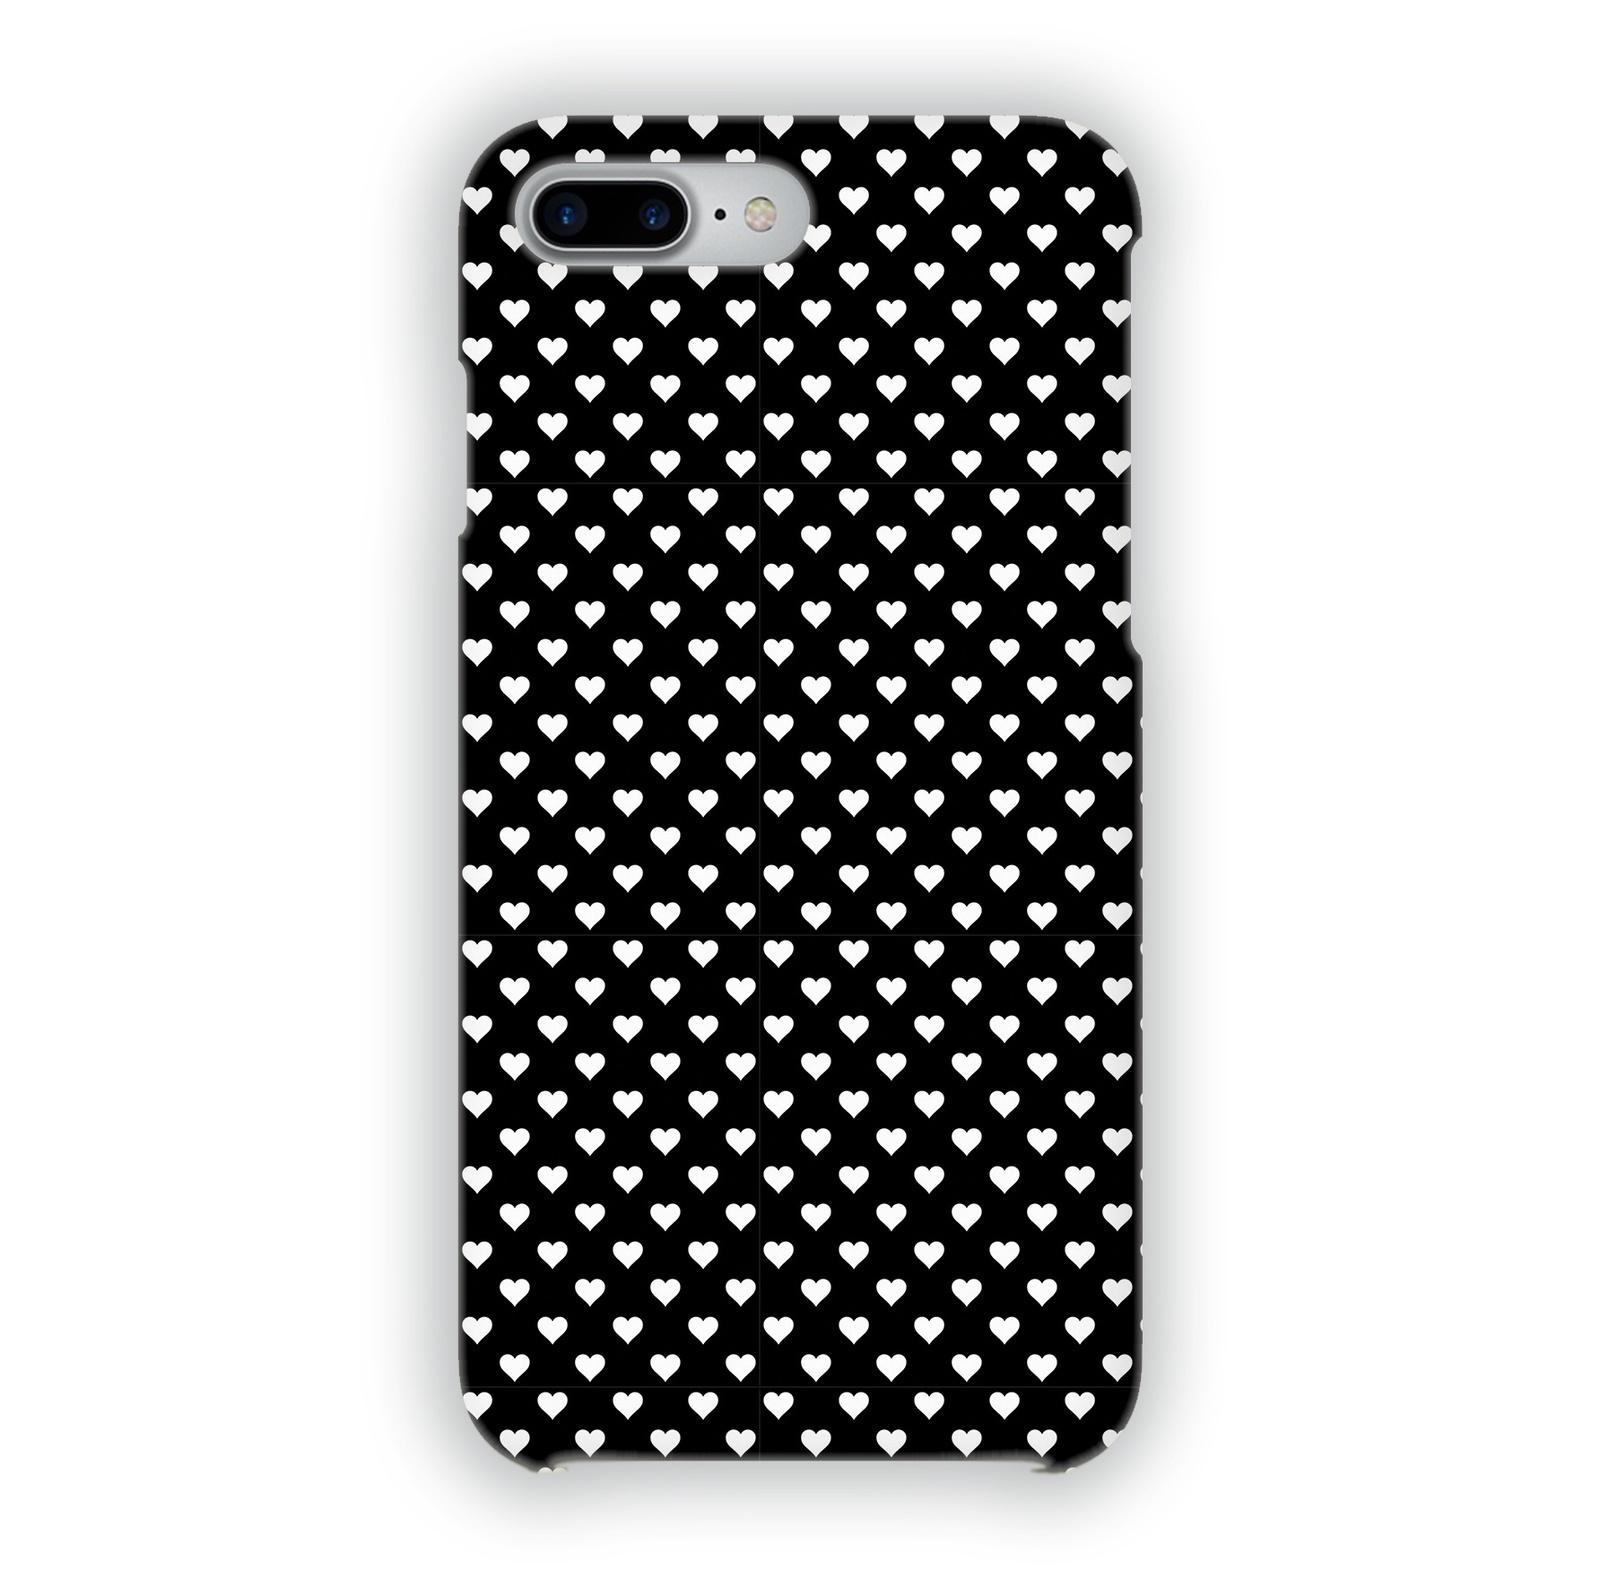 "Чехол Mitya Veselkov ""Белые сердечки на черном"" для iPhone 7 Plus/8 Plus, IP7PLUS.MITYA-031, черный, белый"